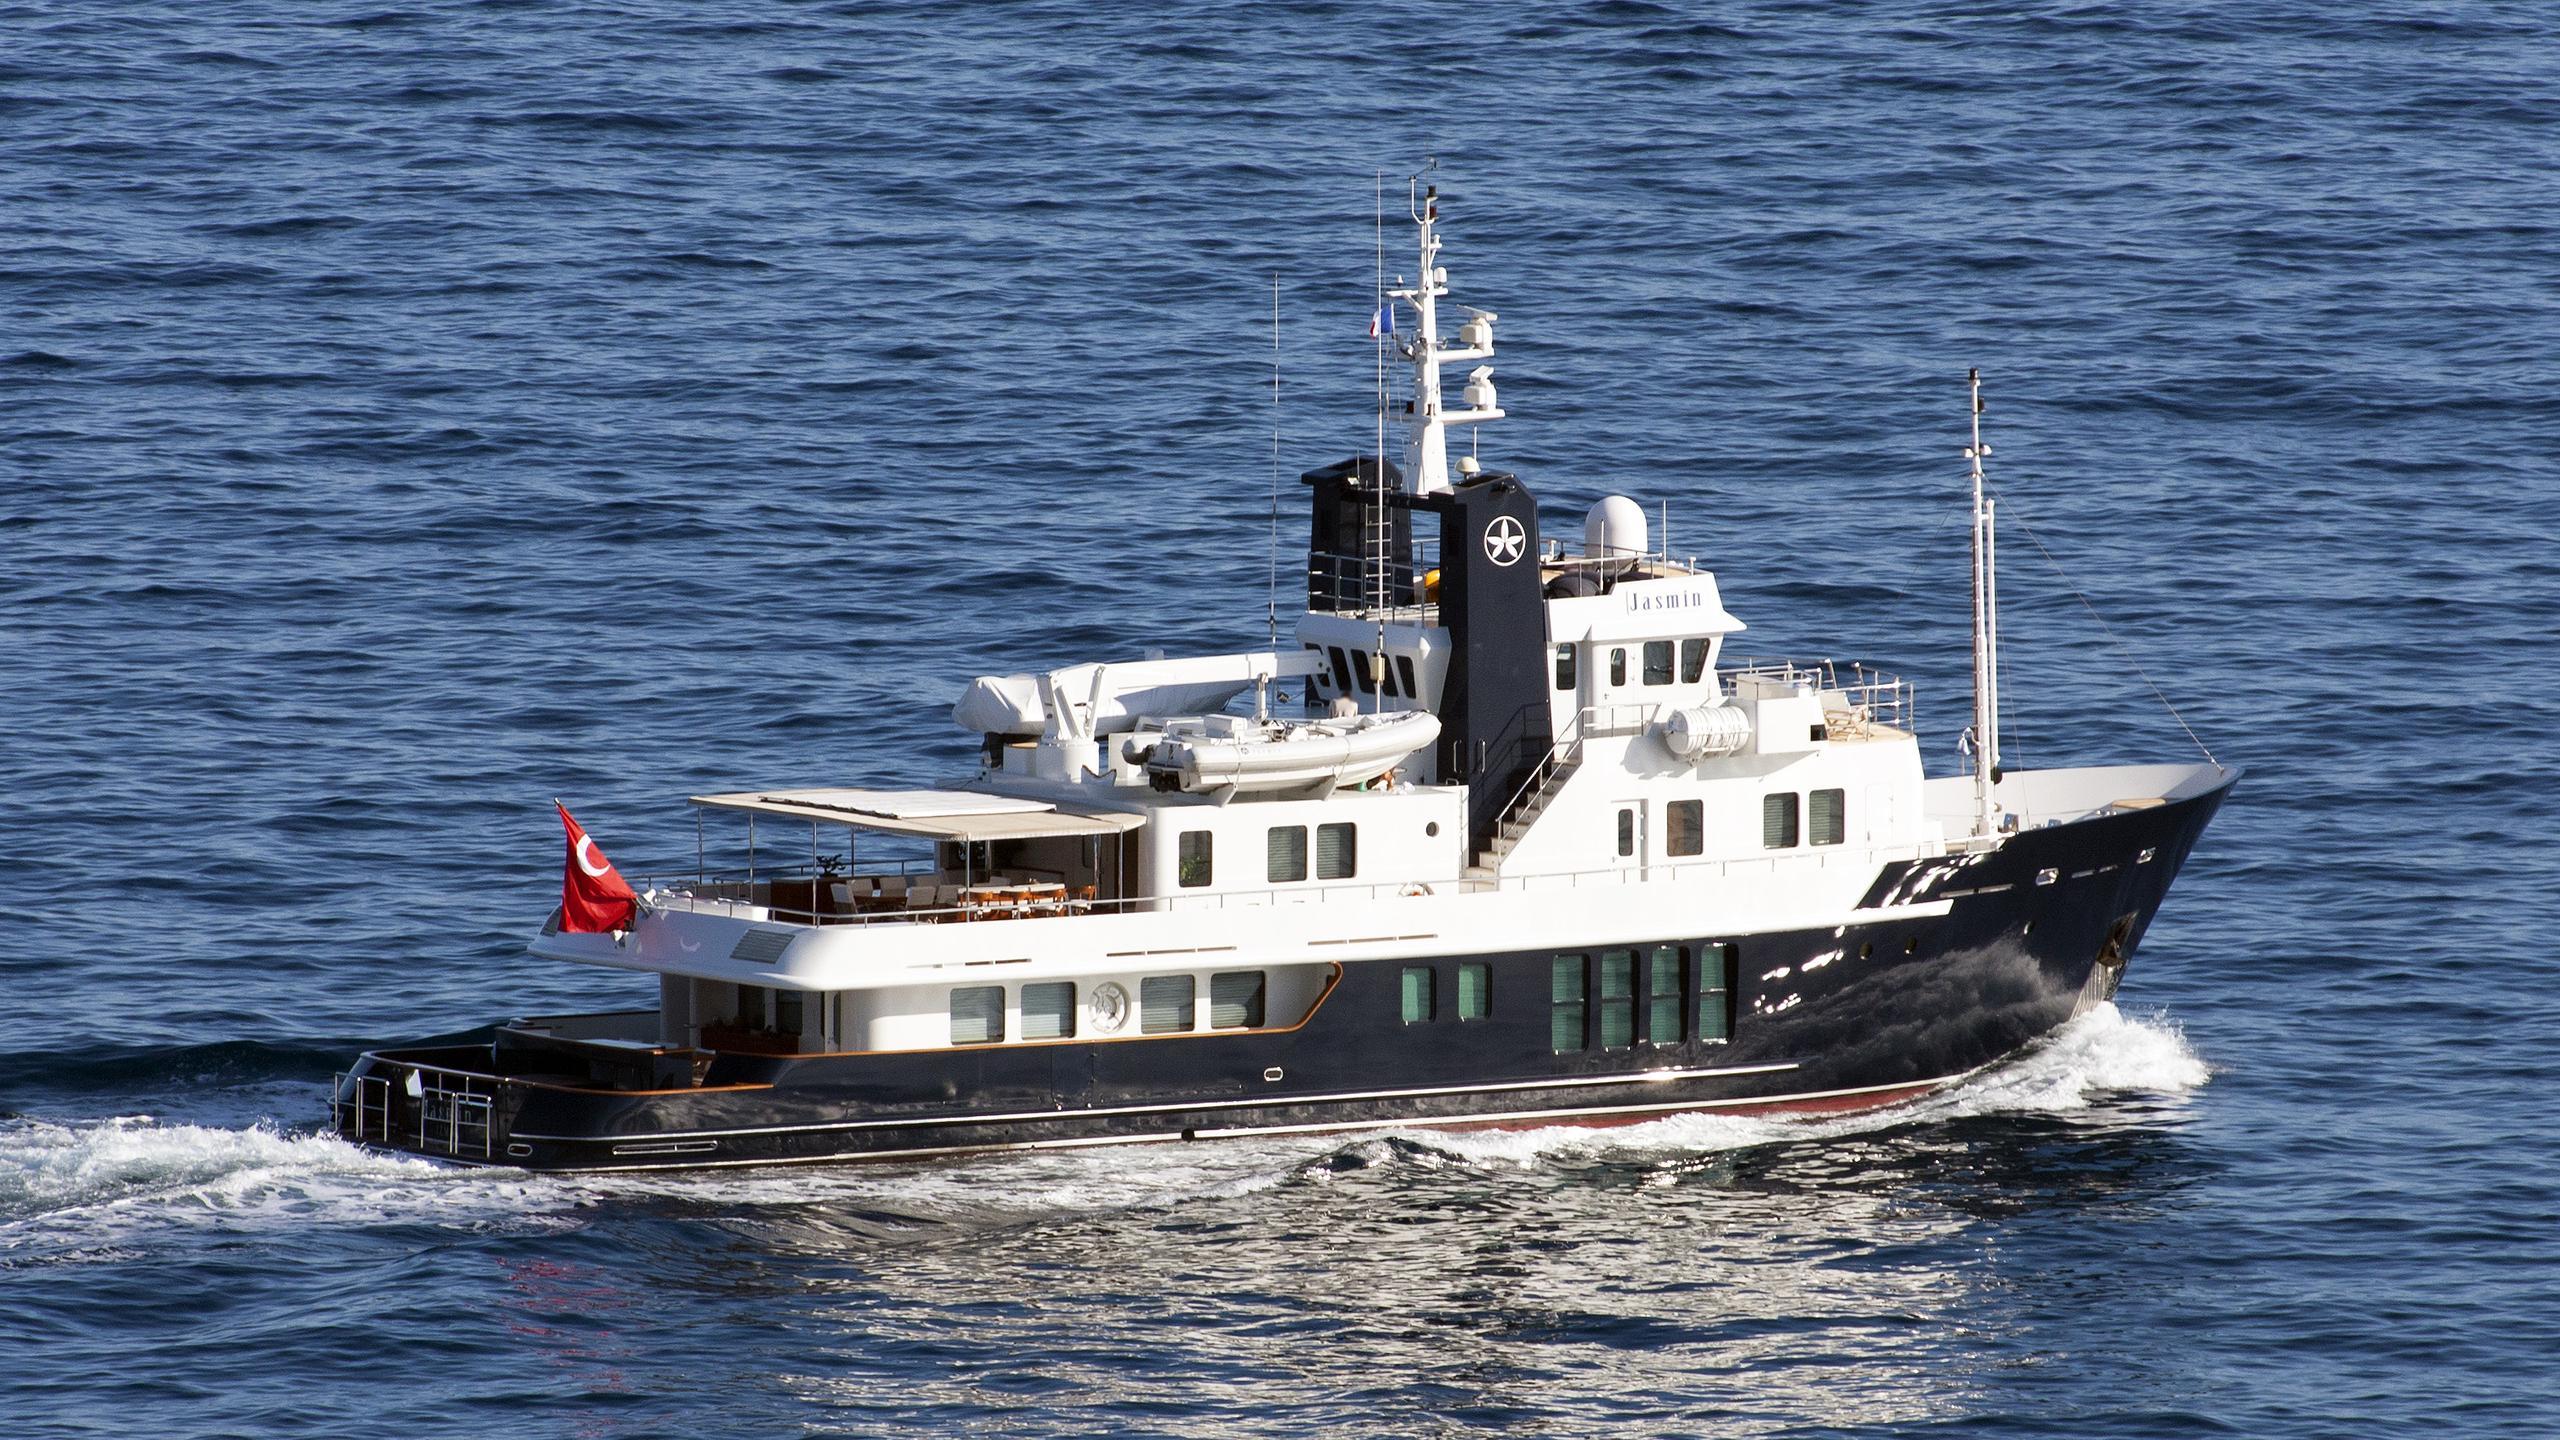 jasmin-explorer-yacht-rmk-marine-2003-37m-cruising-half-profile